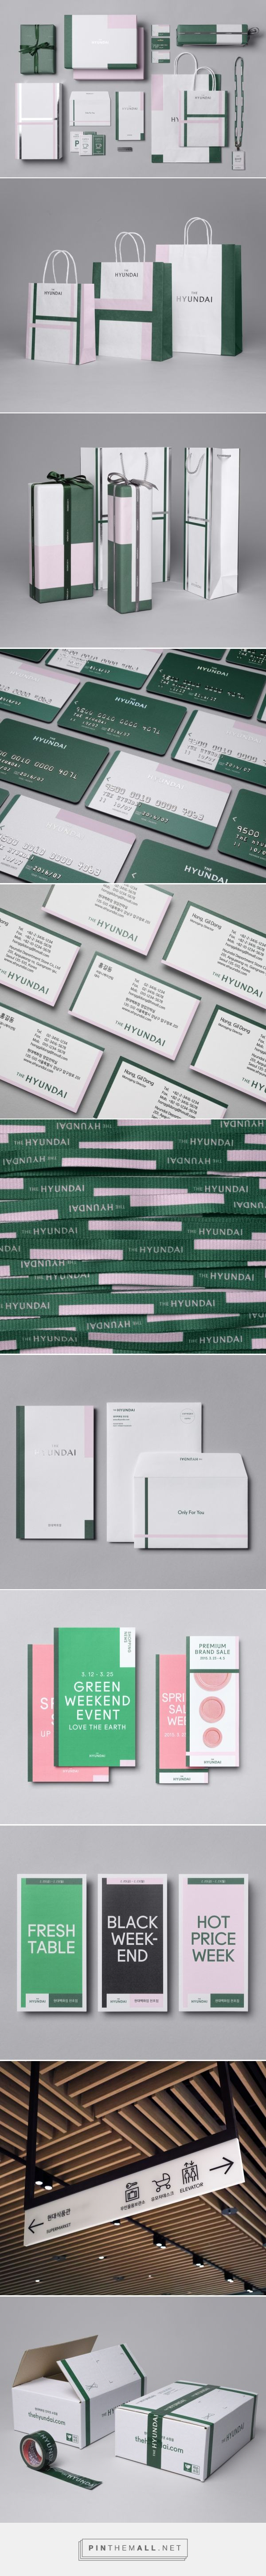 New Brand Identity for The Hyundai by Studio fnt — BP&O